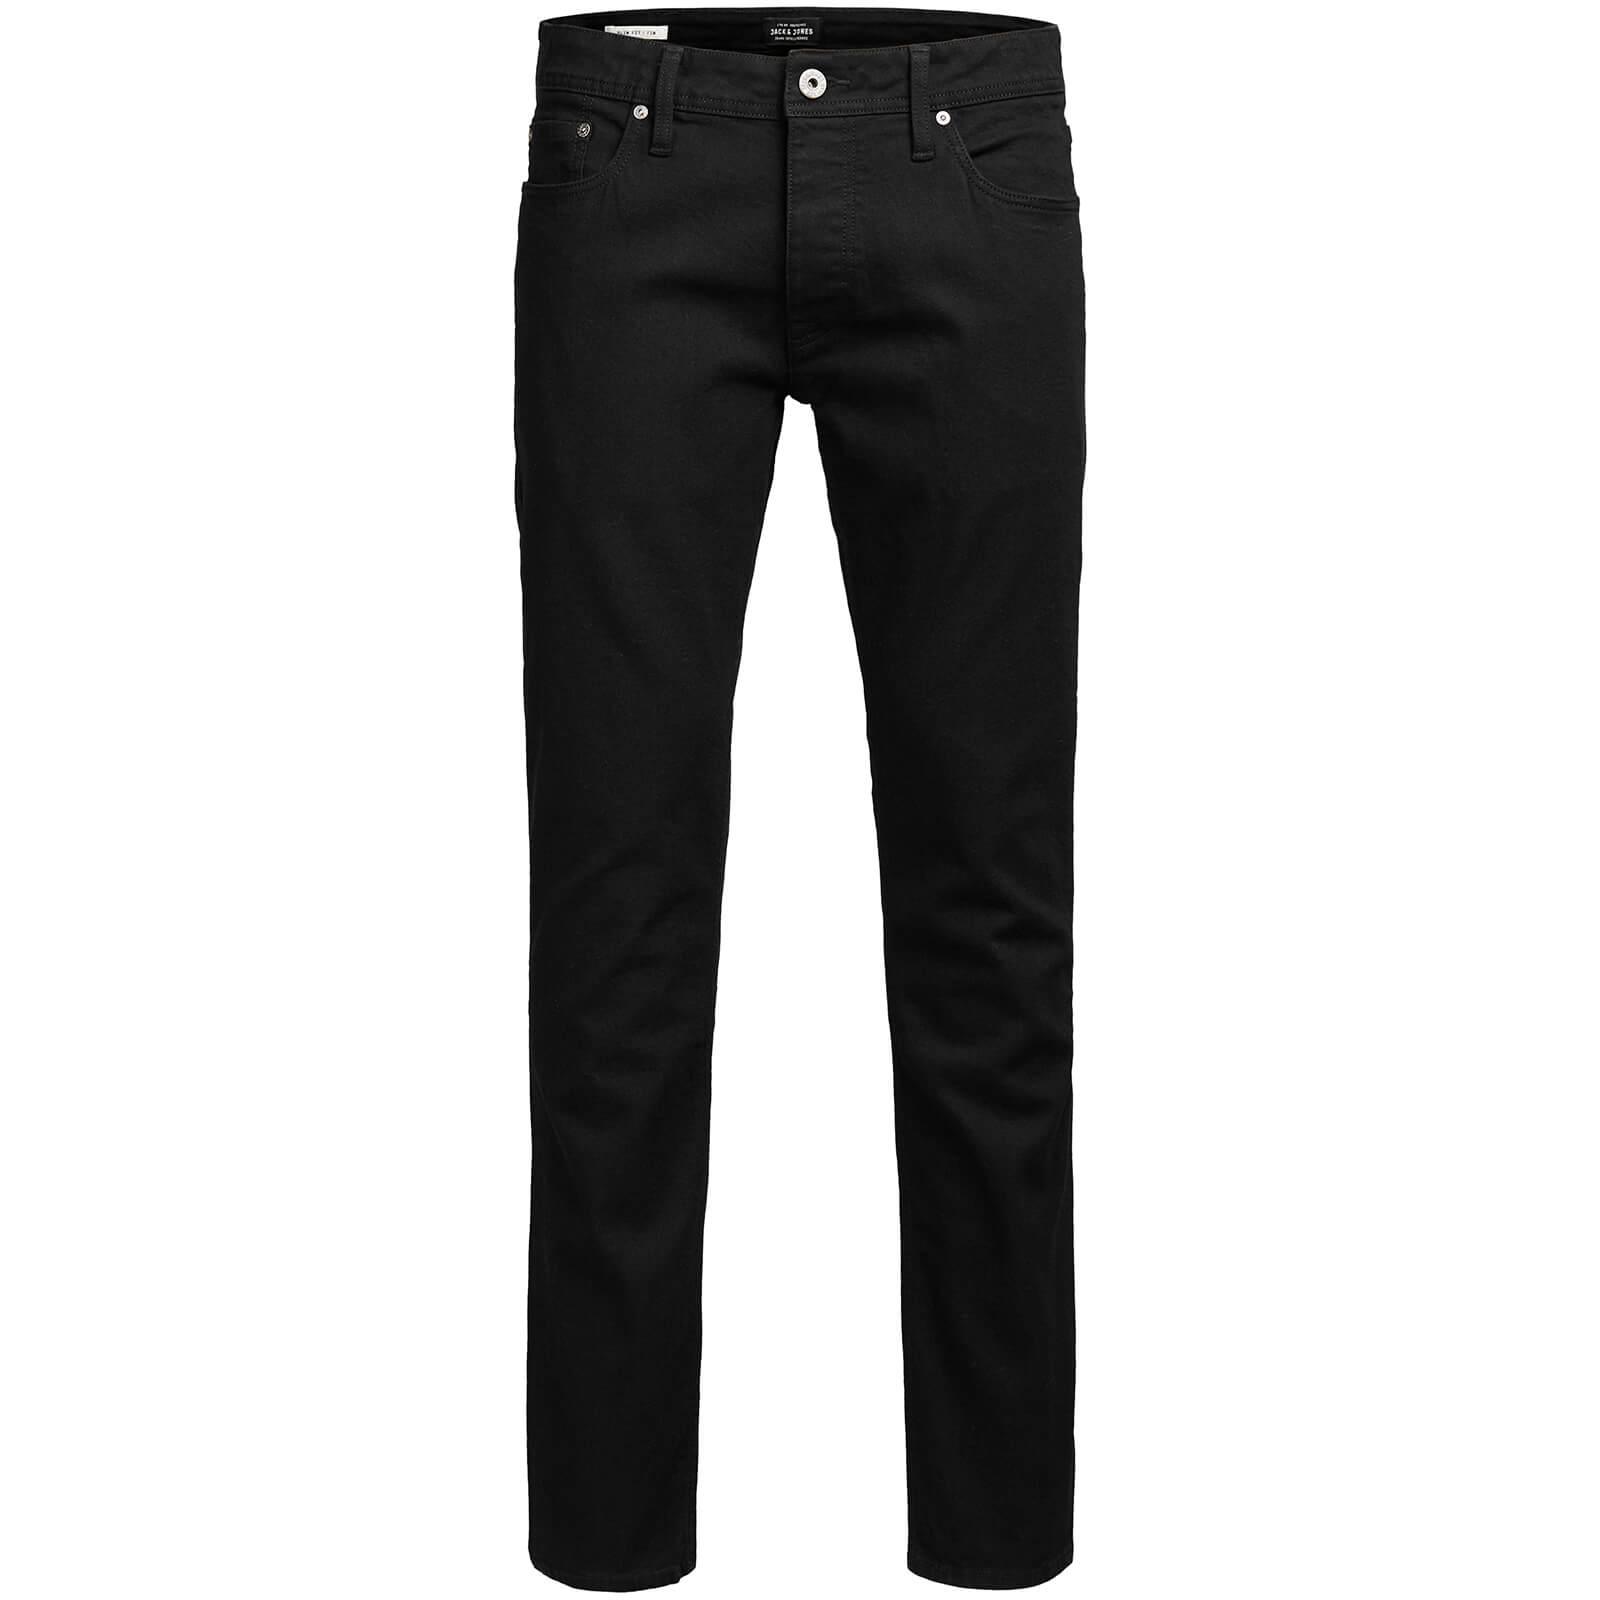 Jack   Jones Originals Men s Tim Slim Fit Jeans - Black Denim Mens ... 8ba7fdfcf37